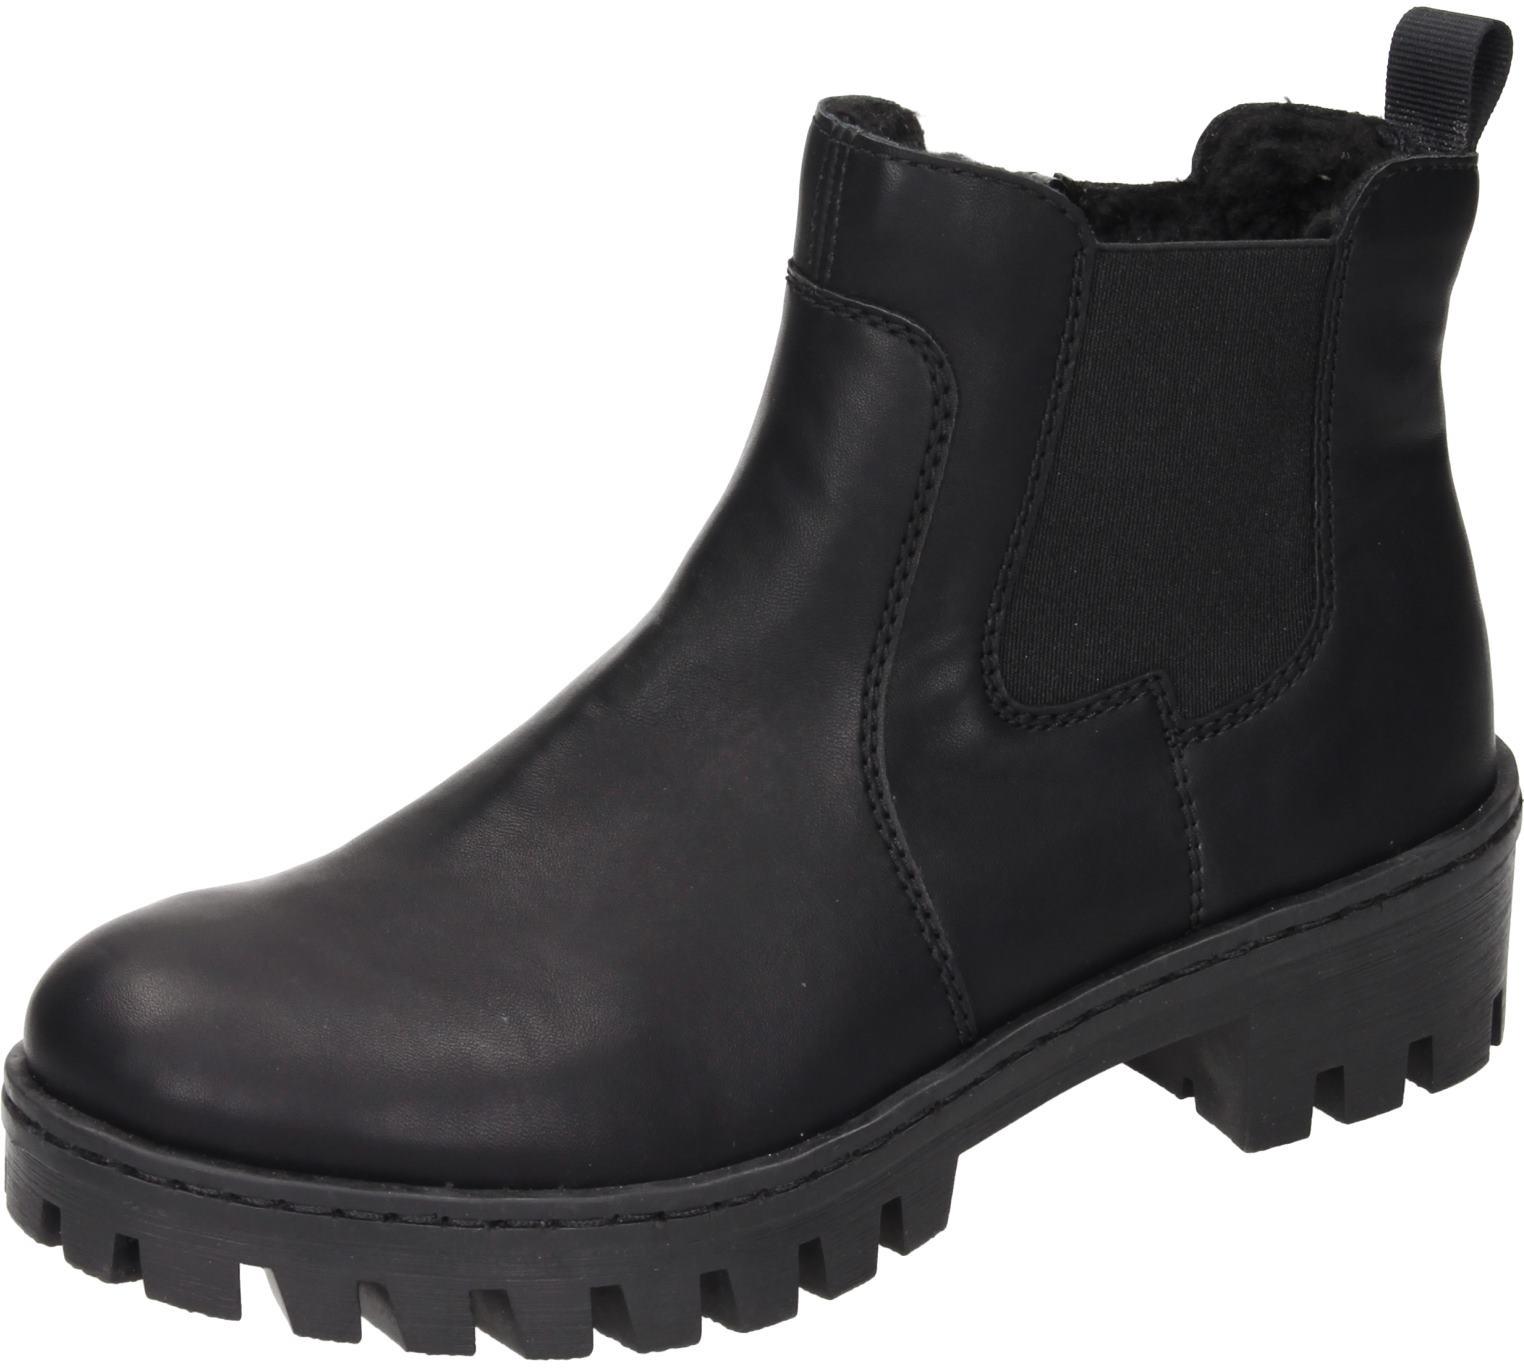 Rieker Damen Schuhe Damen-Stiefelette schwarz Synthetik